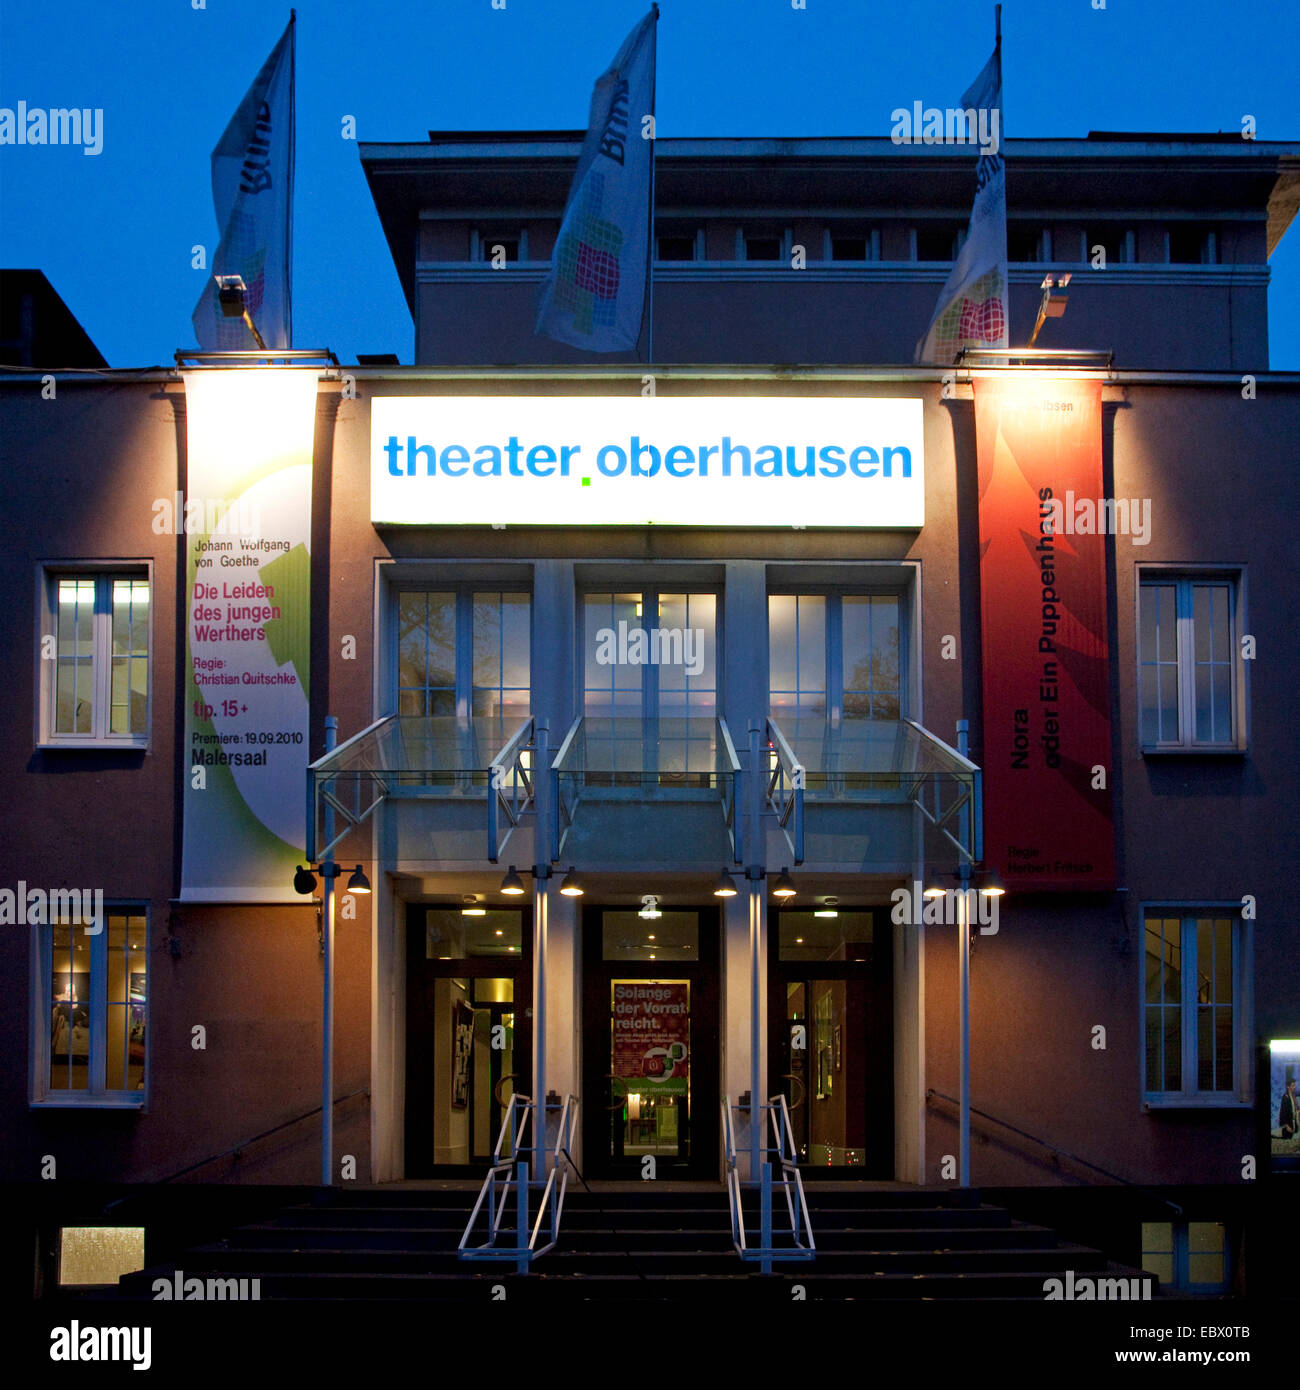 Theater Oberhausen in twilight, Germany, North Rhine-Westphalia, Ruhr Area, Oberhausen Stock Photo